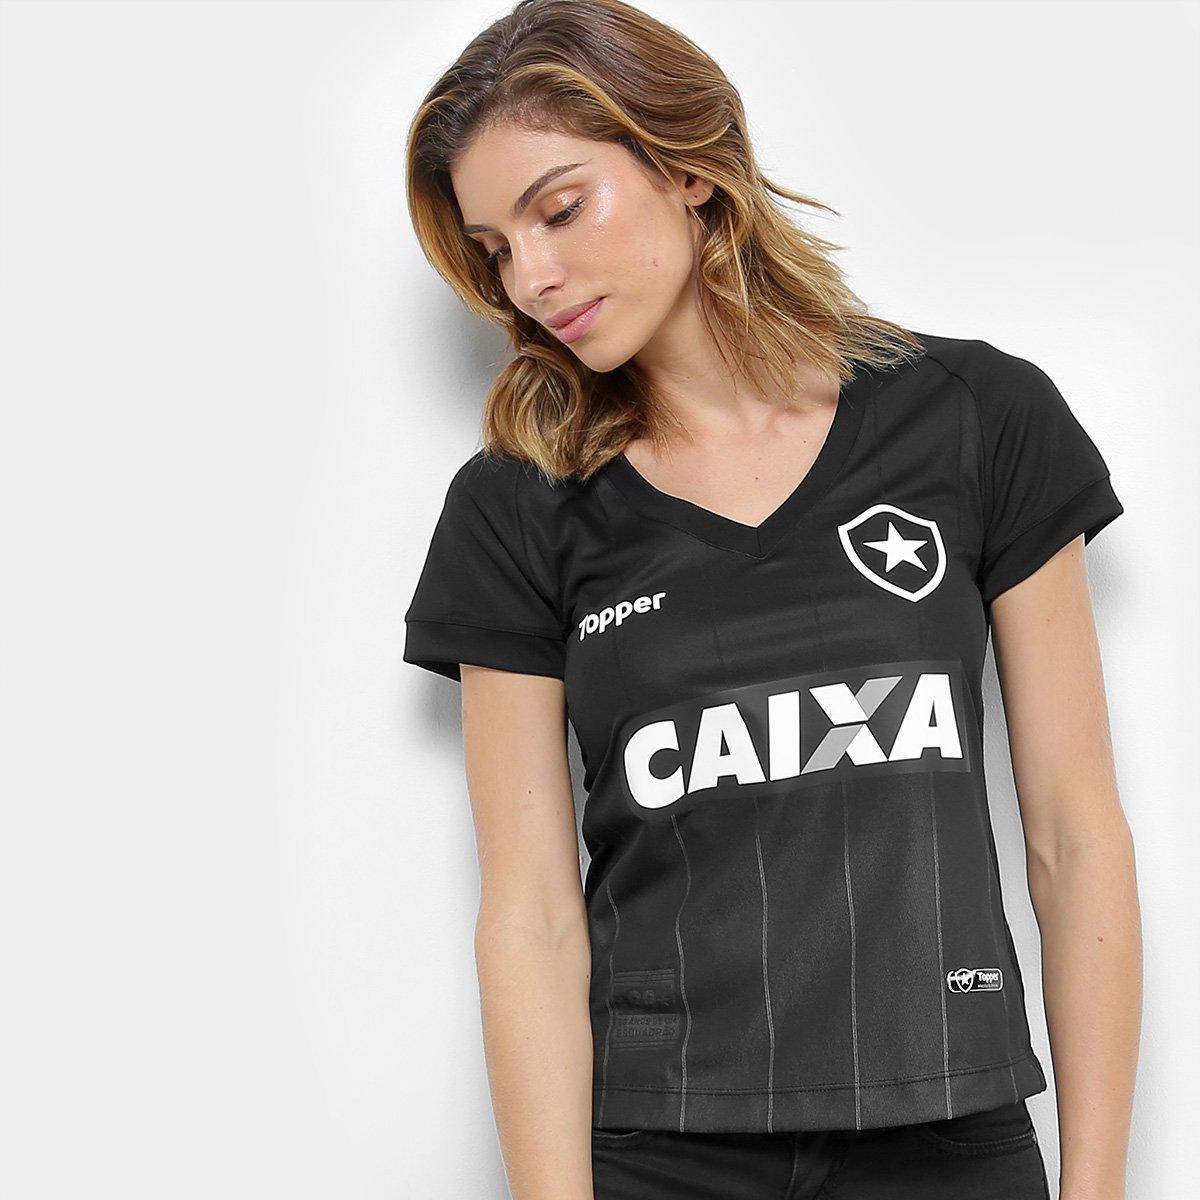 Camisa Botafogo II 2018 s n° Torcedor Topper Feminina - Preto e Chumbo -  Compre Agora  2dc861cdacfc1